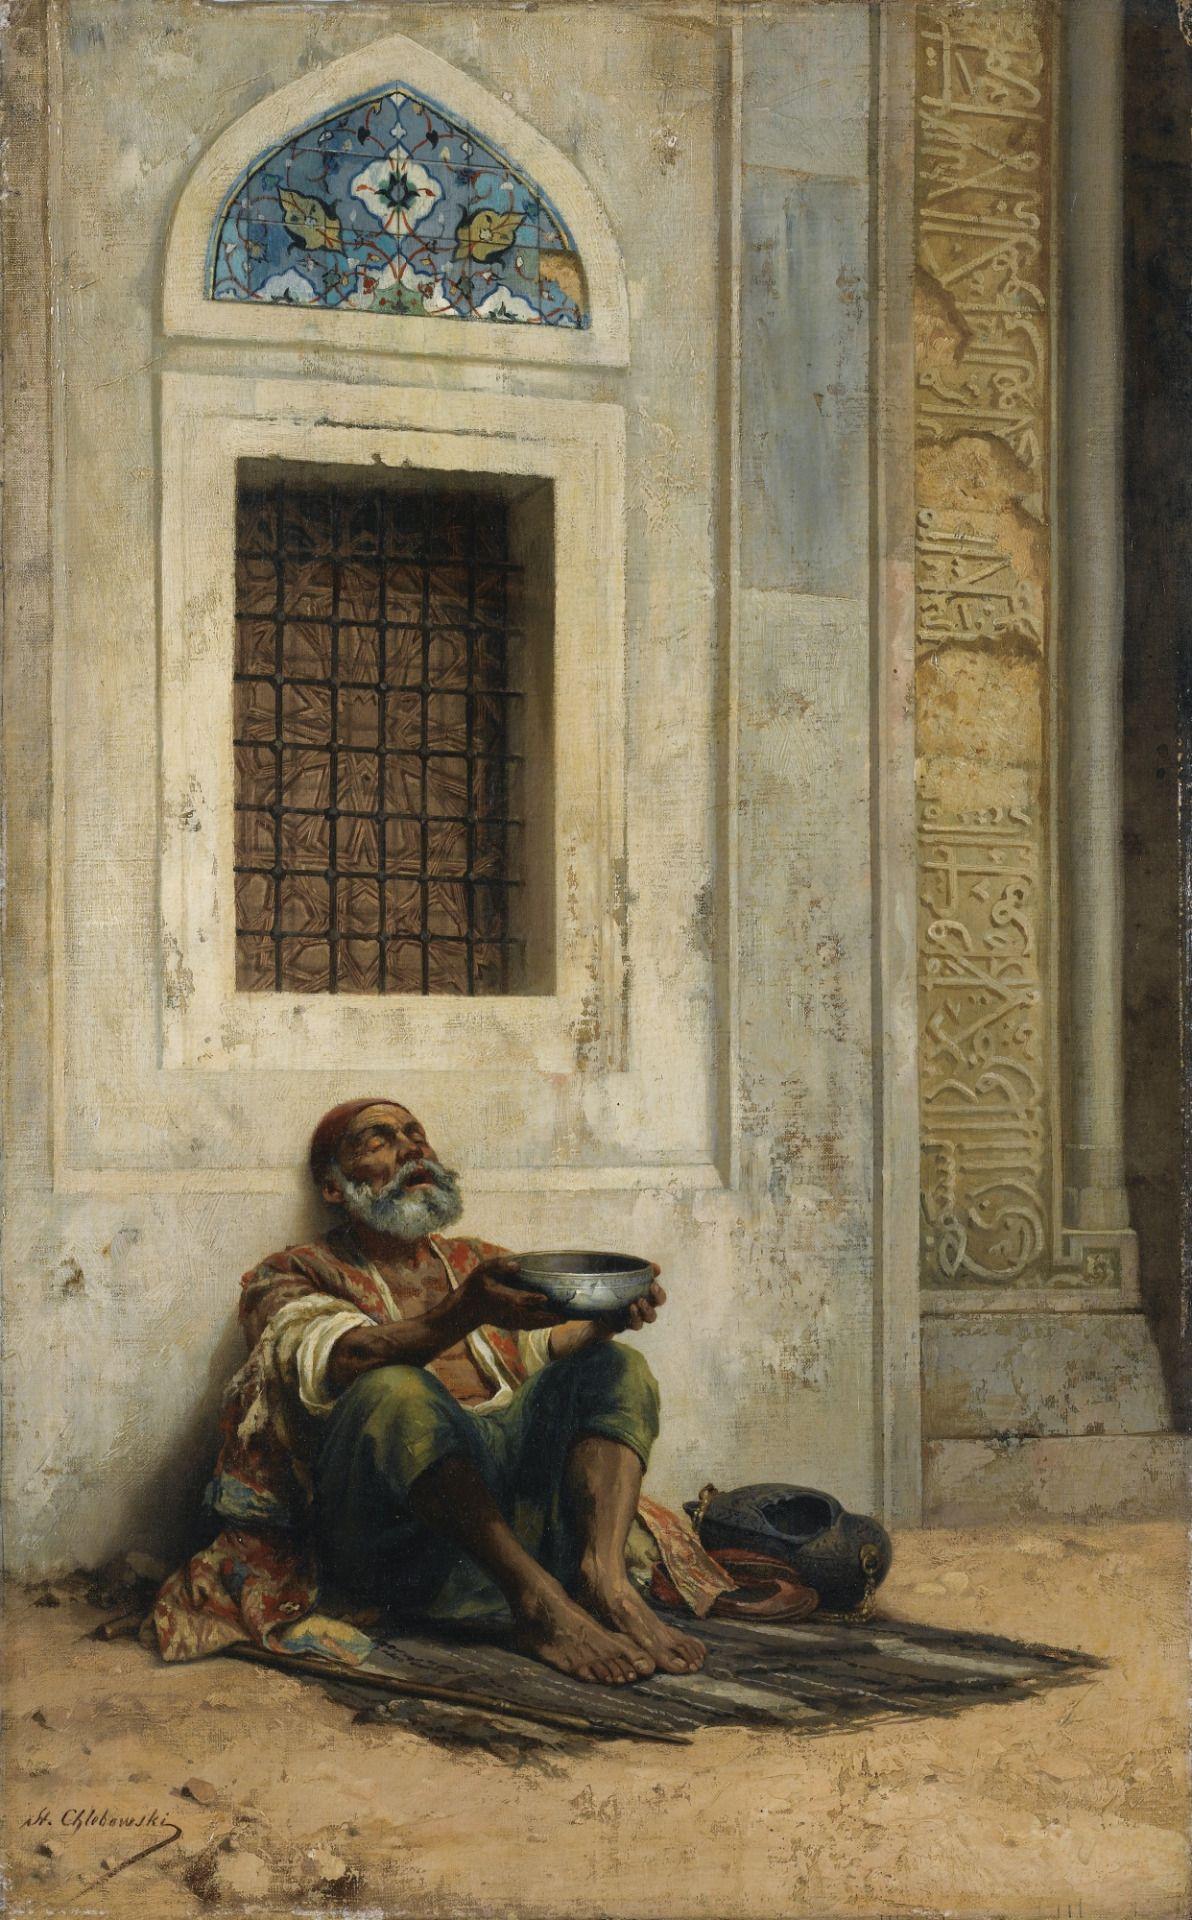 mendicant at the Mosque door , Stanislaus von Chlebowski 1835 - 1884